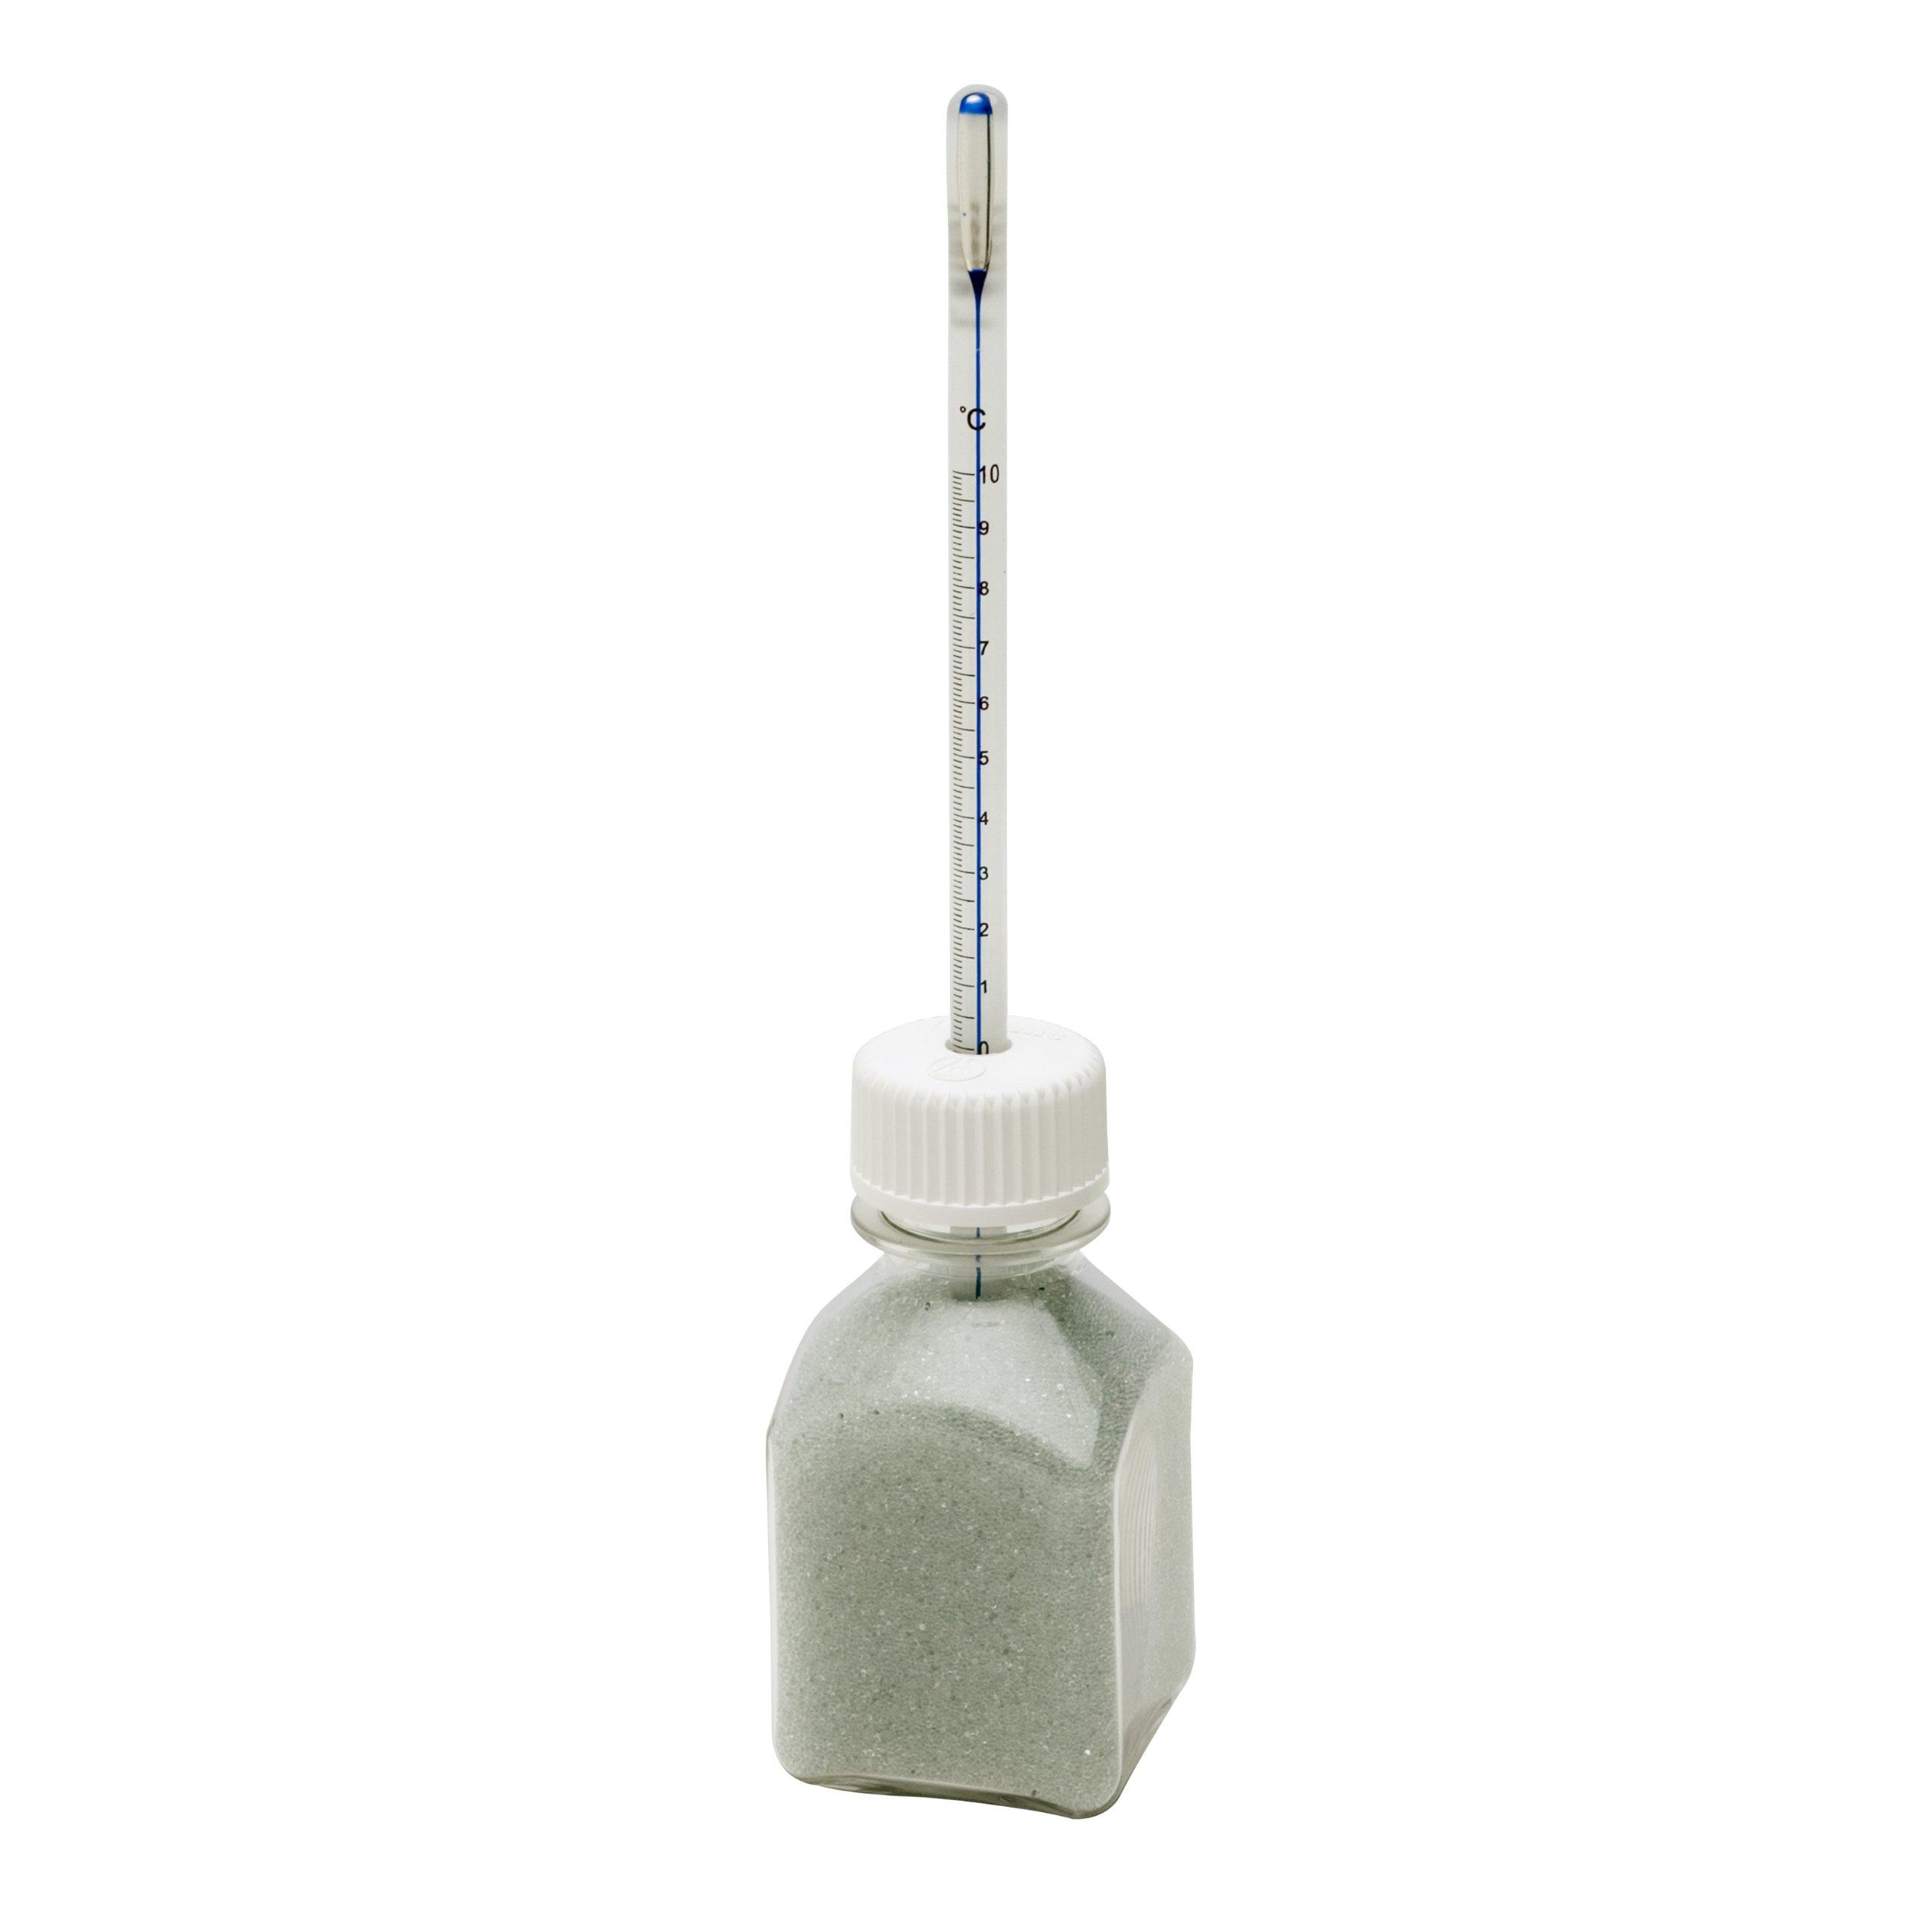 H-B DURAC Plus B60600-1000 Incubator Verification Thermometer; 15 to 50C